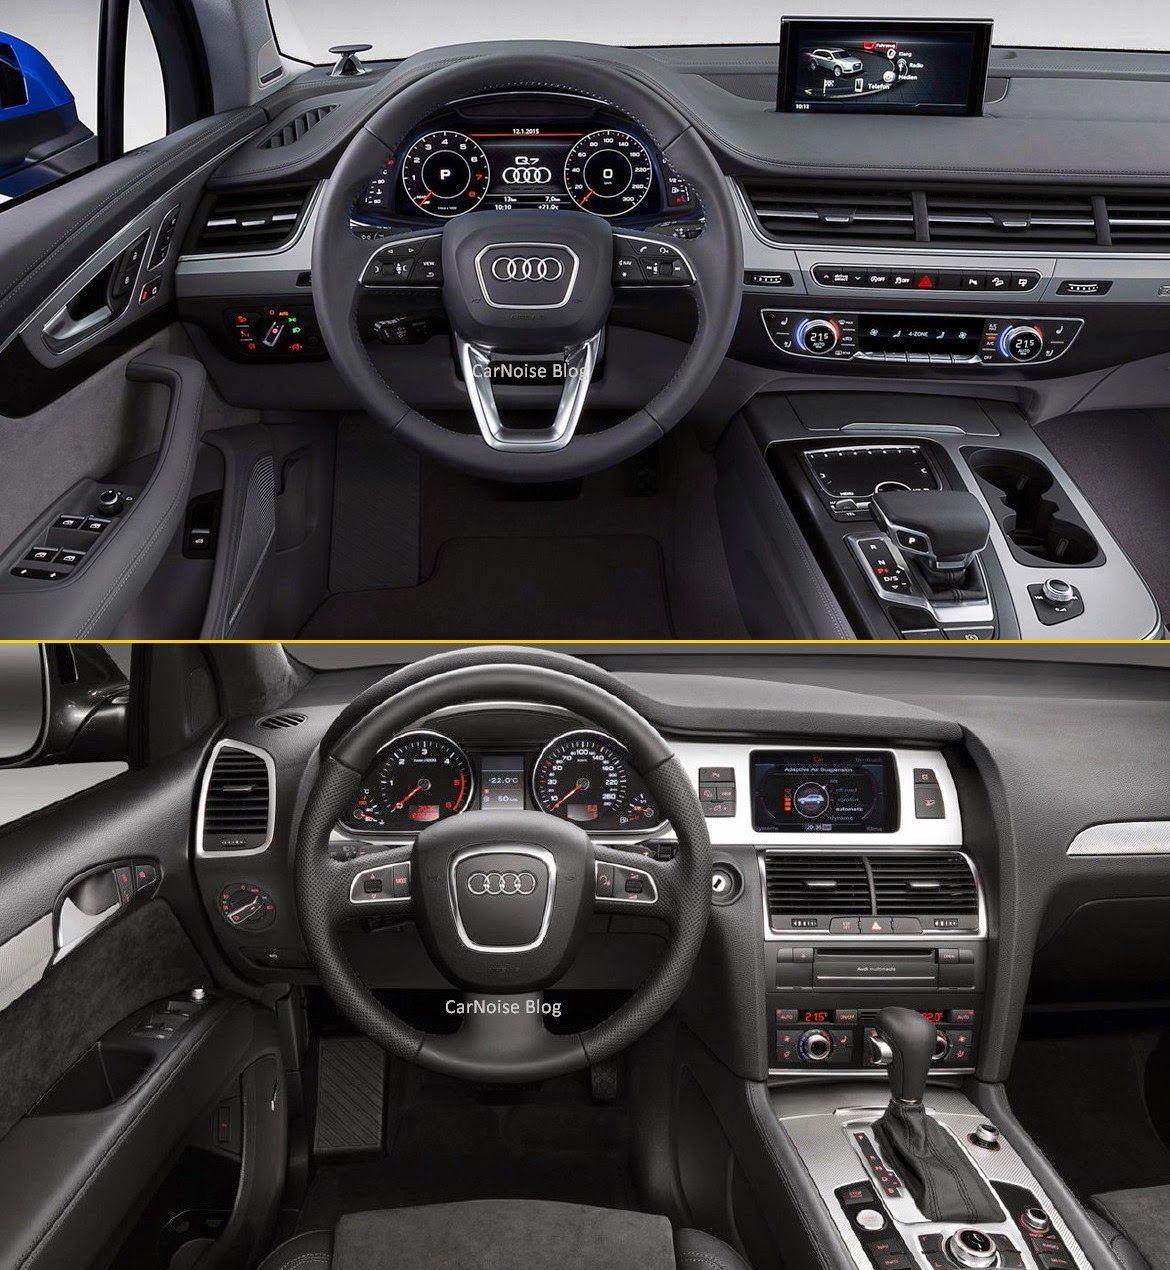 Interior Dashboard View: 2015-2016 Audi 1st Gen Q7 Vs 2nd